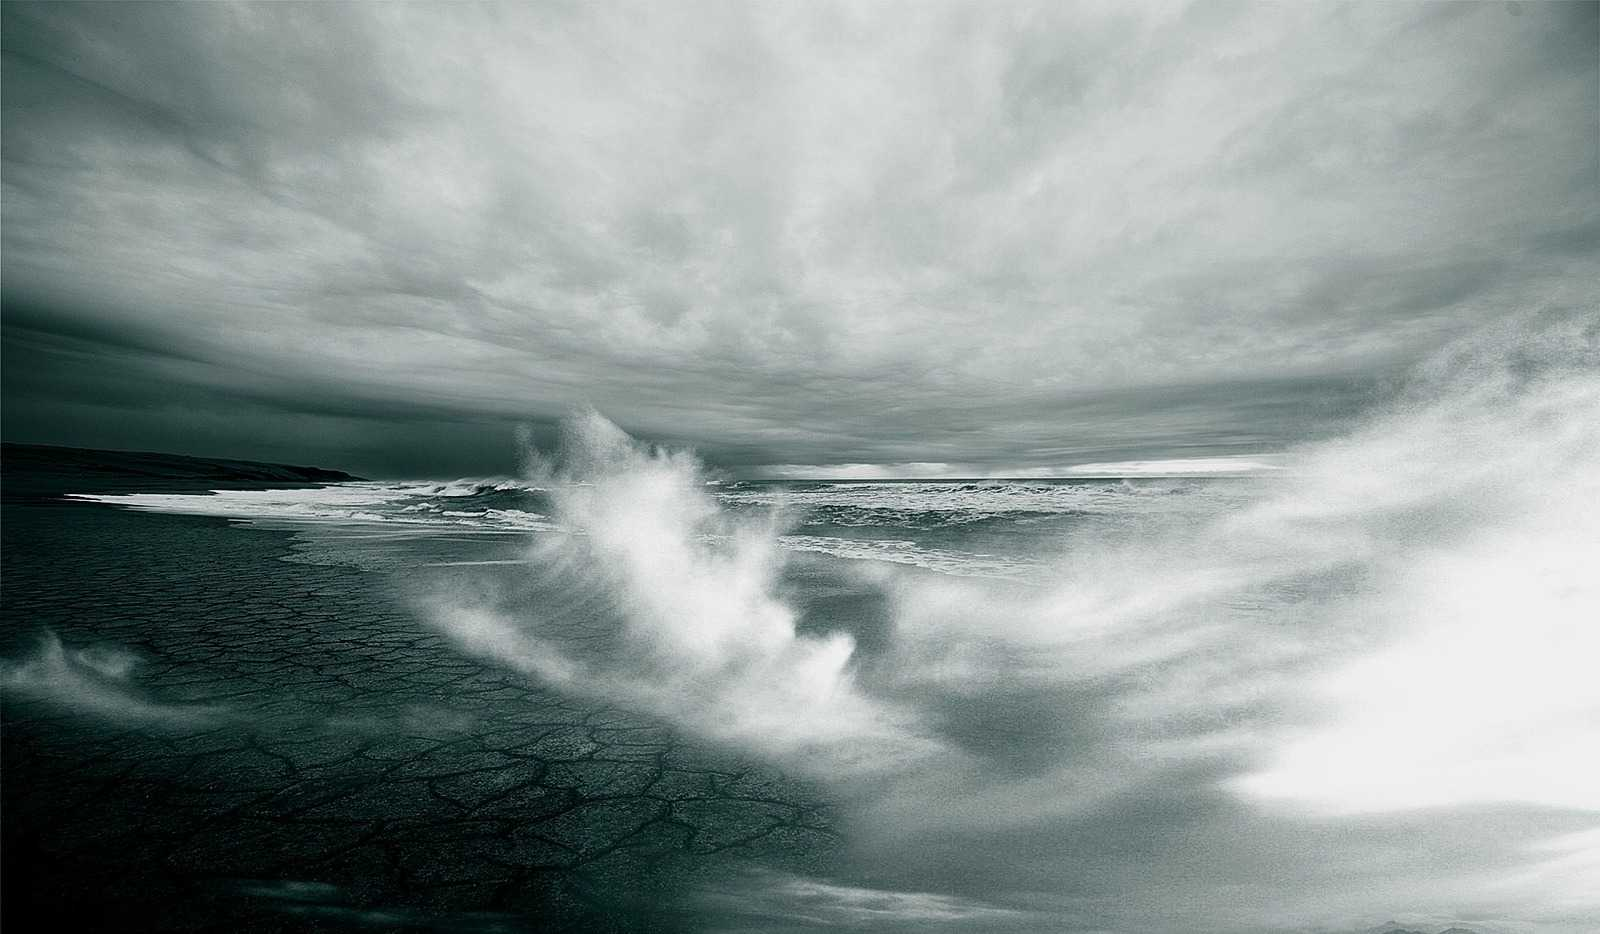 Шторм на море. Фото: Free-Photos/Pixabay.